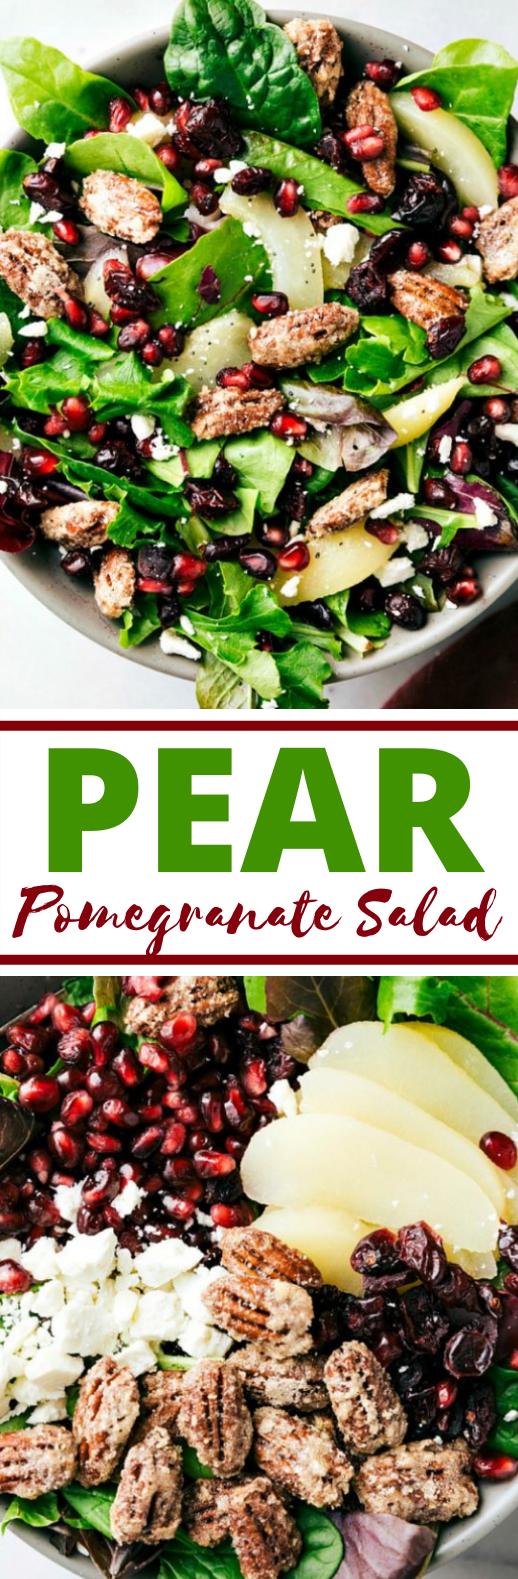 Pear Salad #vegetarian #salad #healthy #fall #lunch